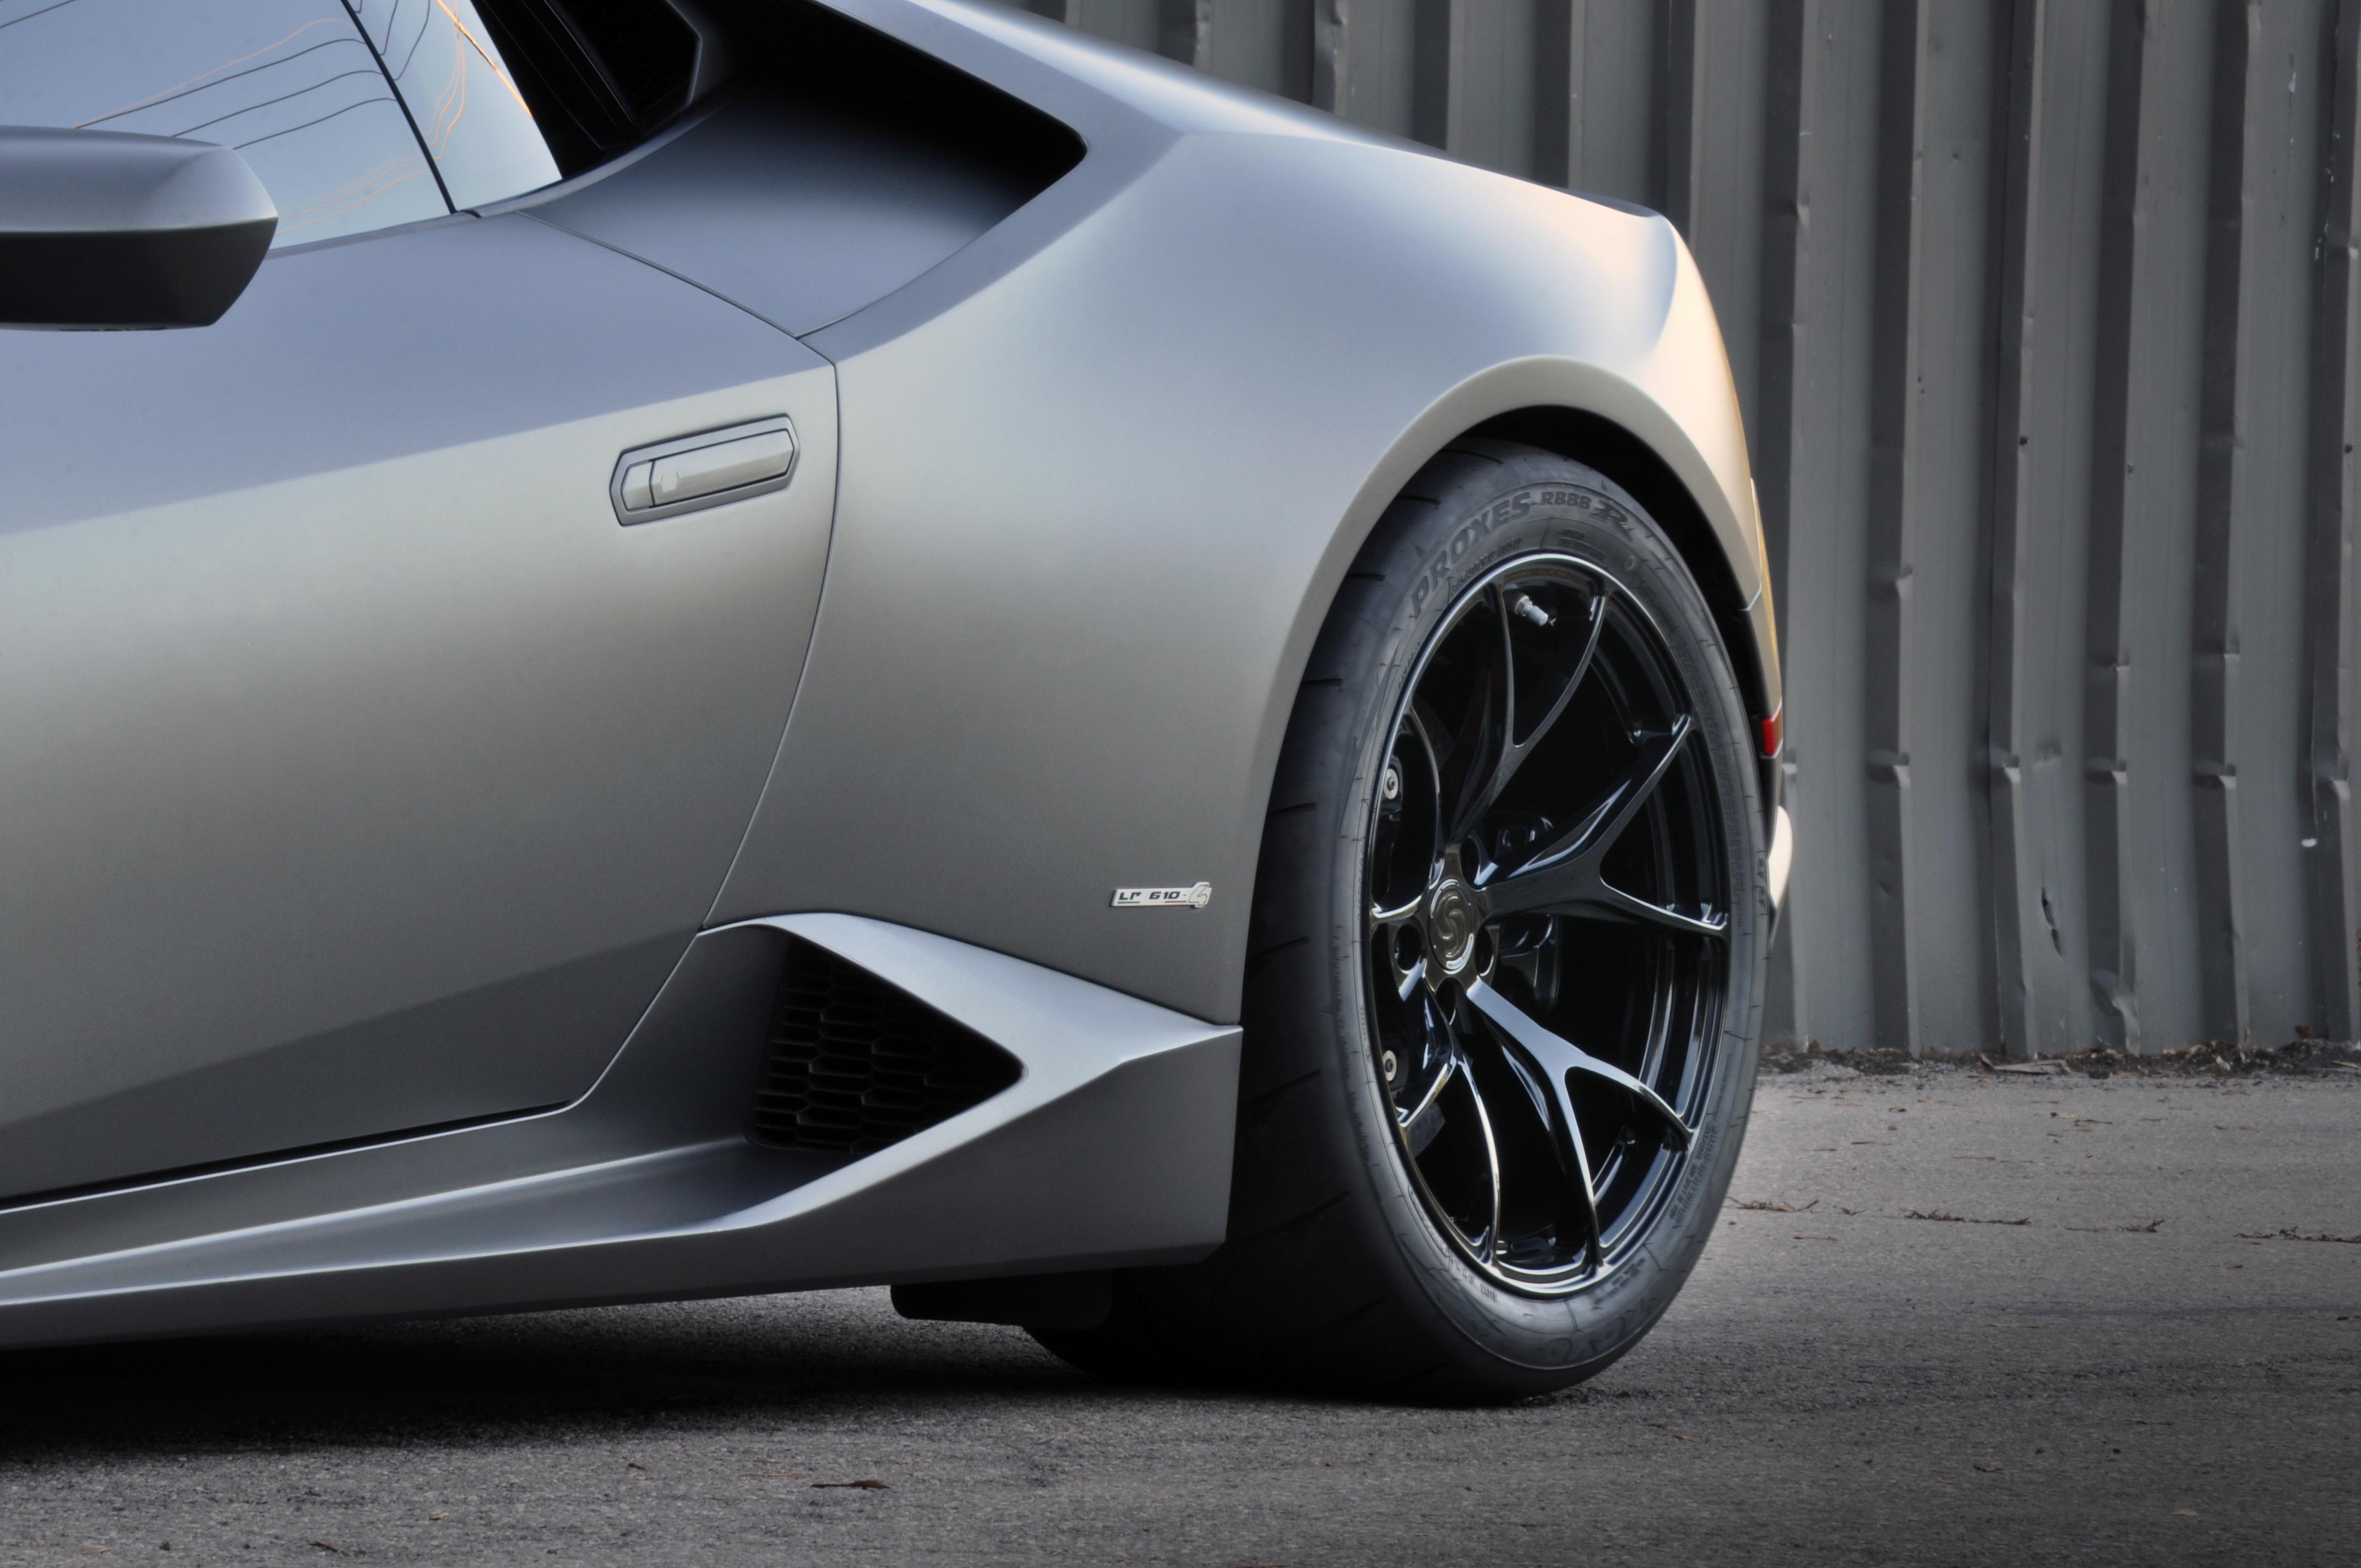 High Res Desktop Wallpaper 2015 Lamborghini Huracan matte grey metallic